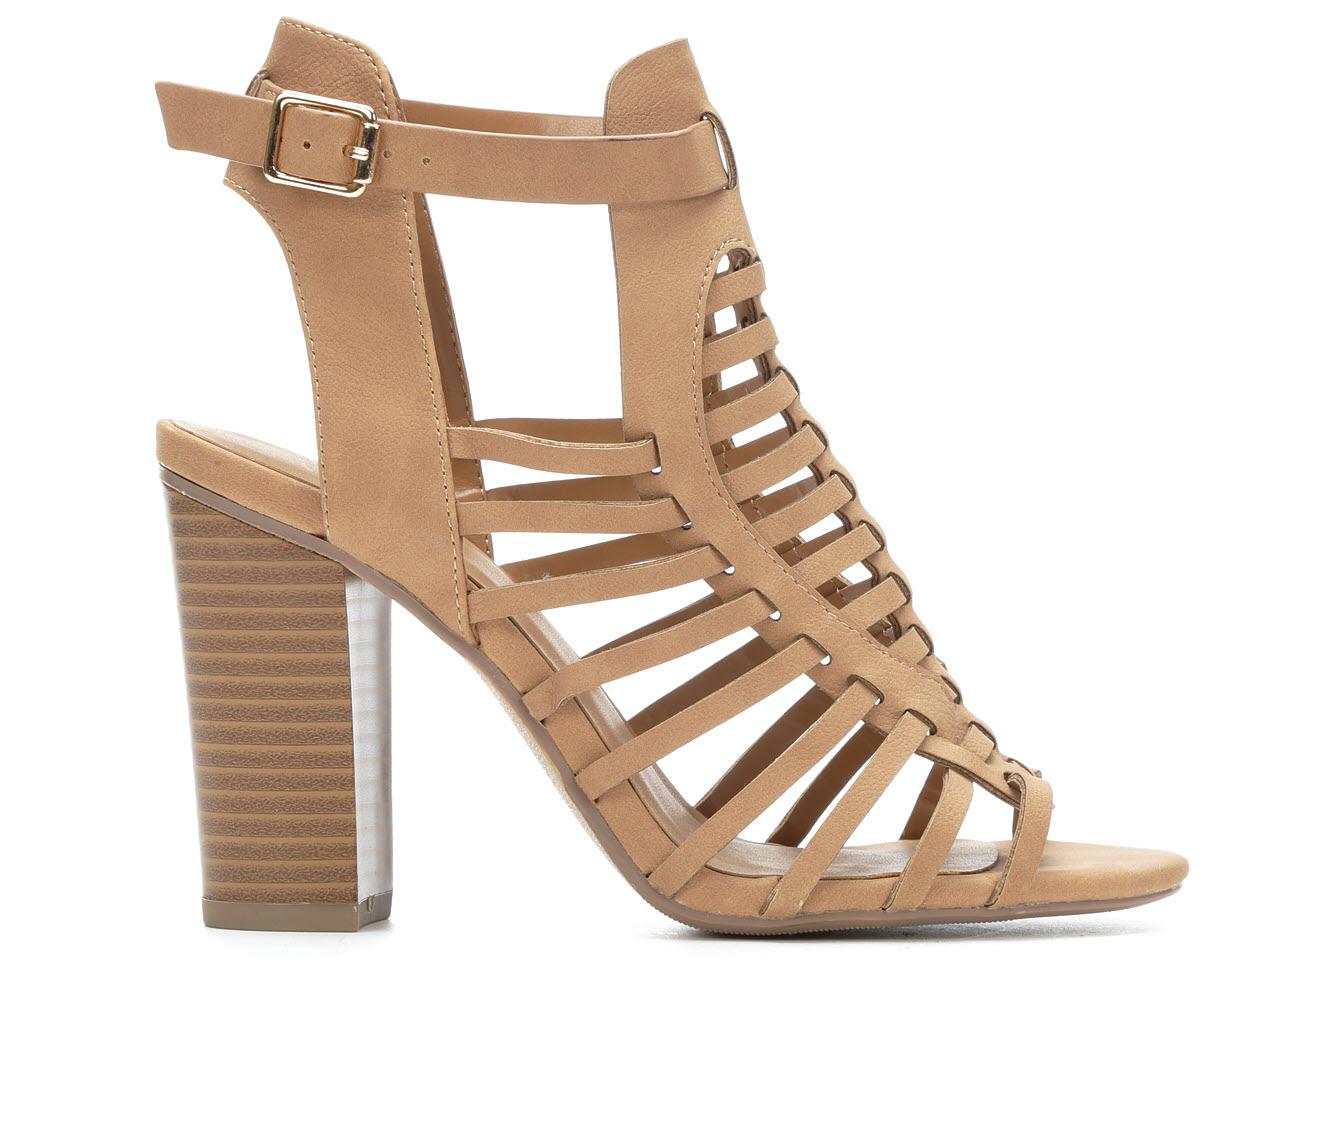 Delicious Ibiza Women's Dress Shoe (Beige Faux Leather)